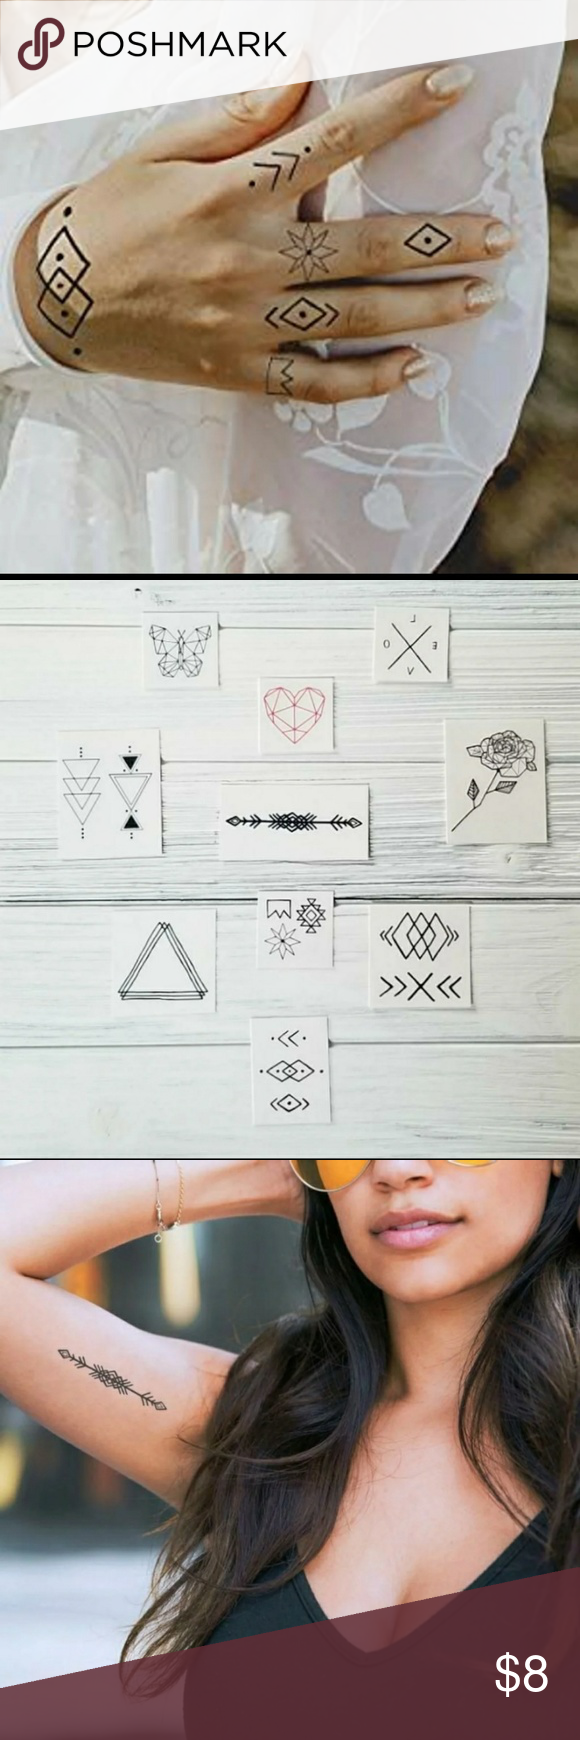 INKED ByDani Geometric Temporary Tattoos Versatile